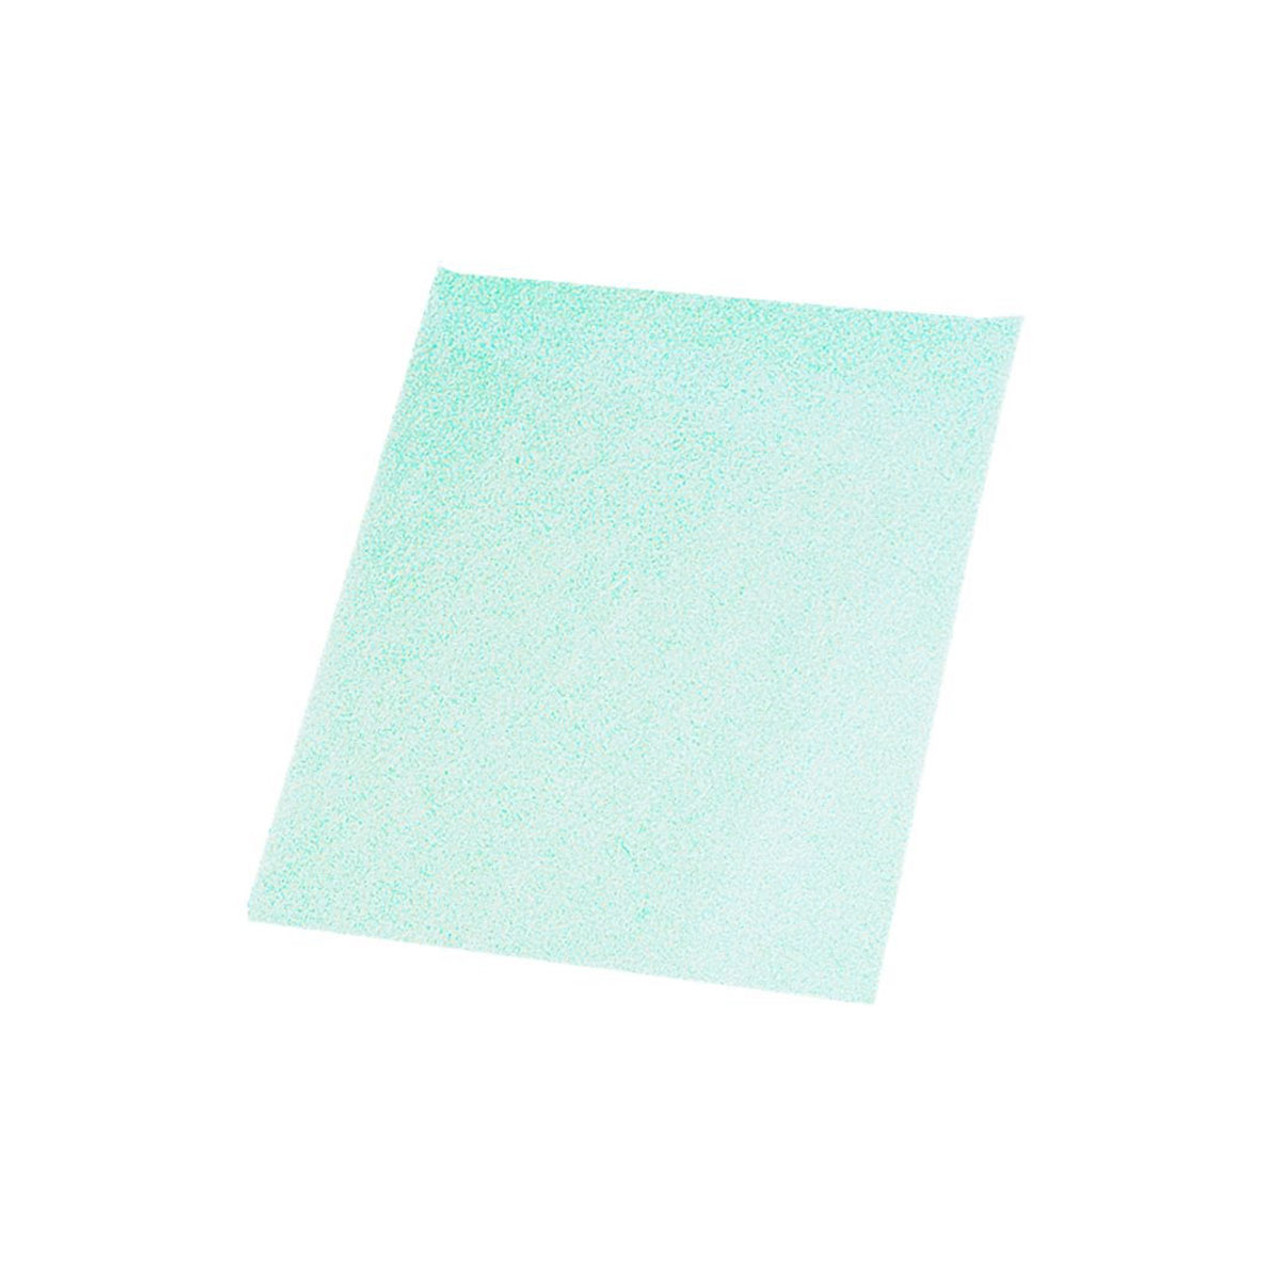 3M Polishing Paper - Mint - 2 Micron